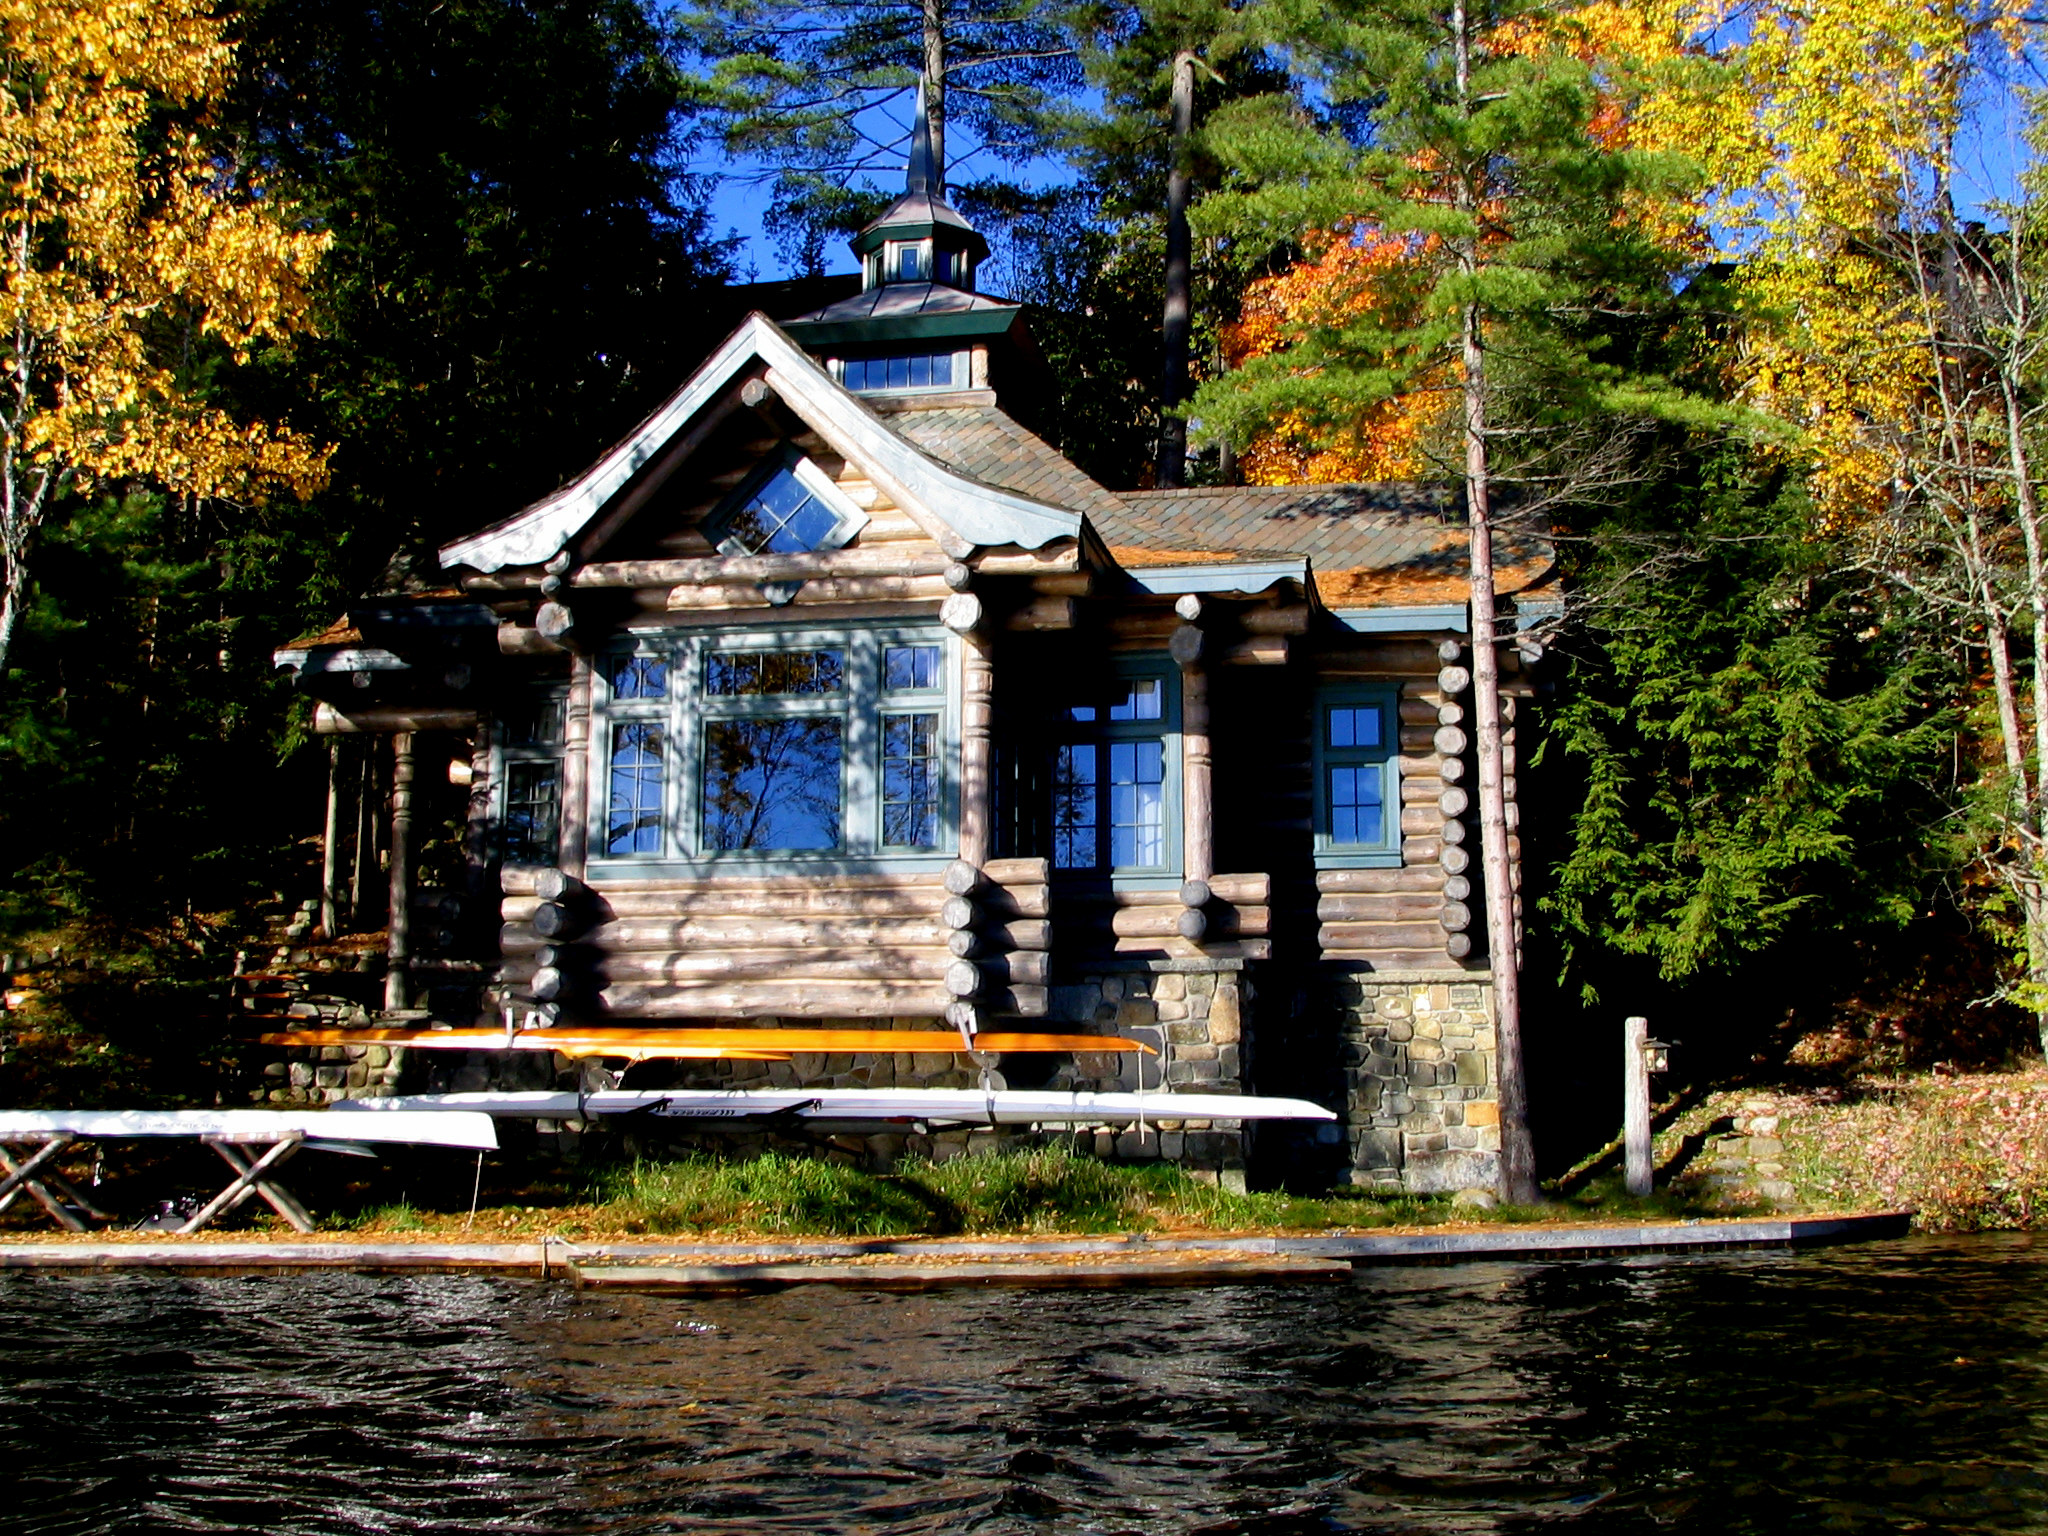 Home Interior Design Software File Topridge Between Boathouses Jpg Wikimedia Commons